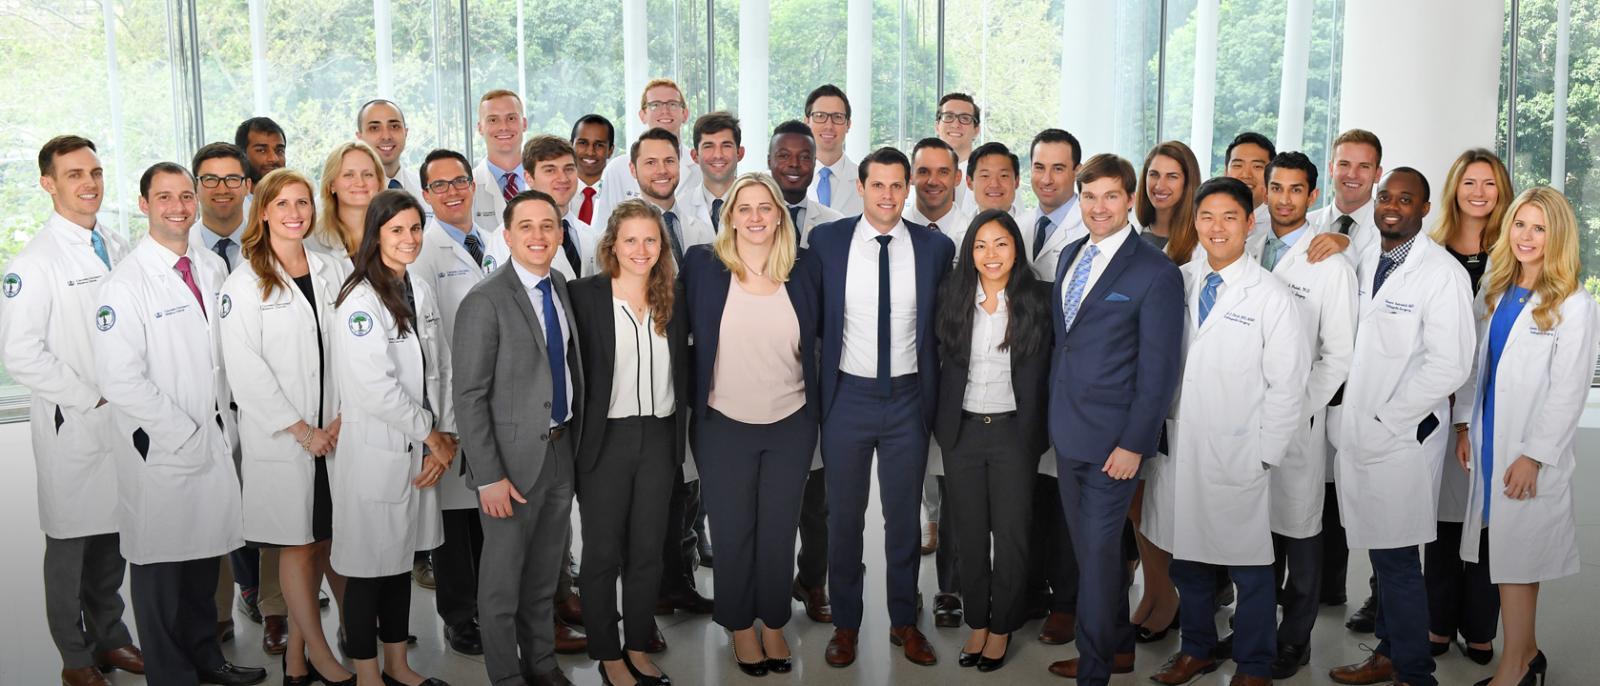 Group photo of Columbia Orthopedics residents